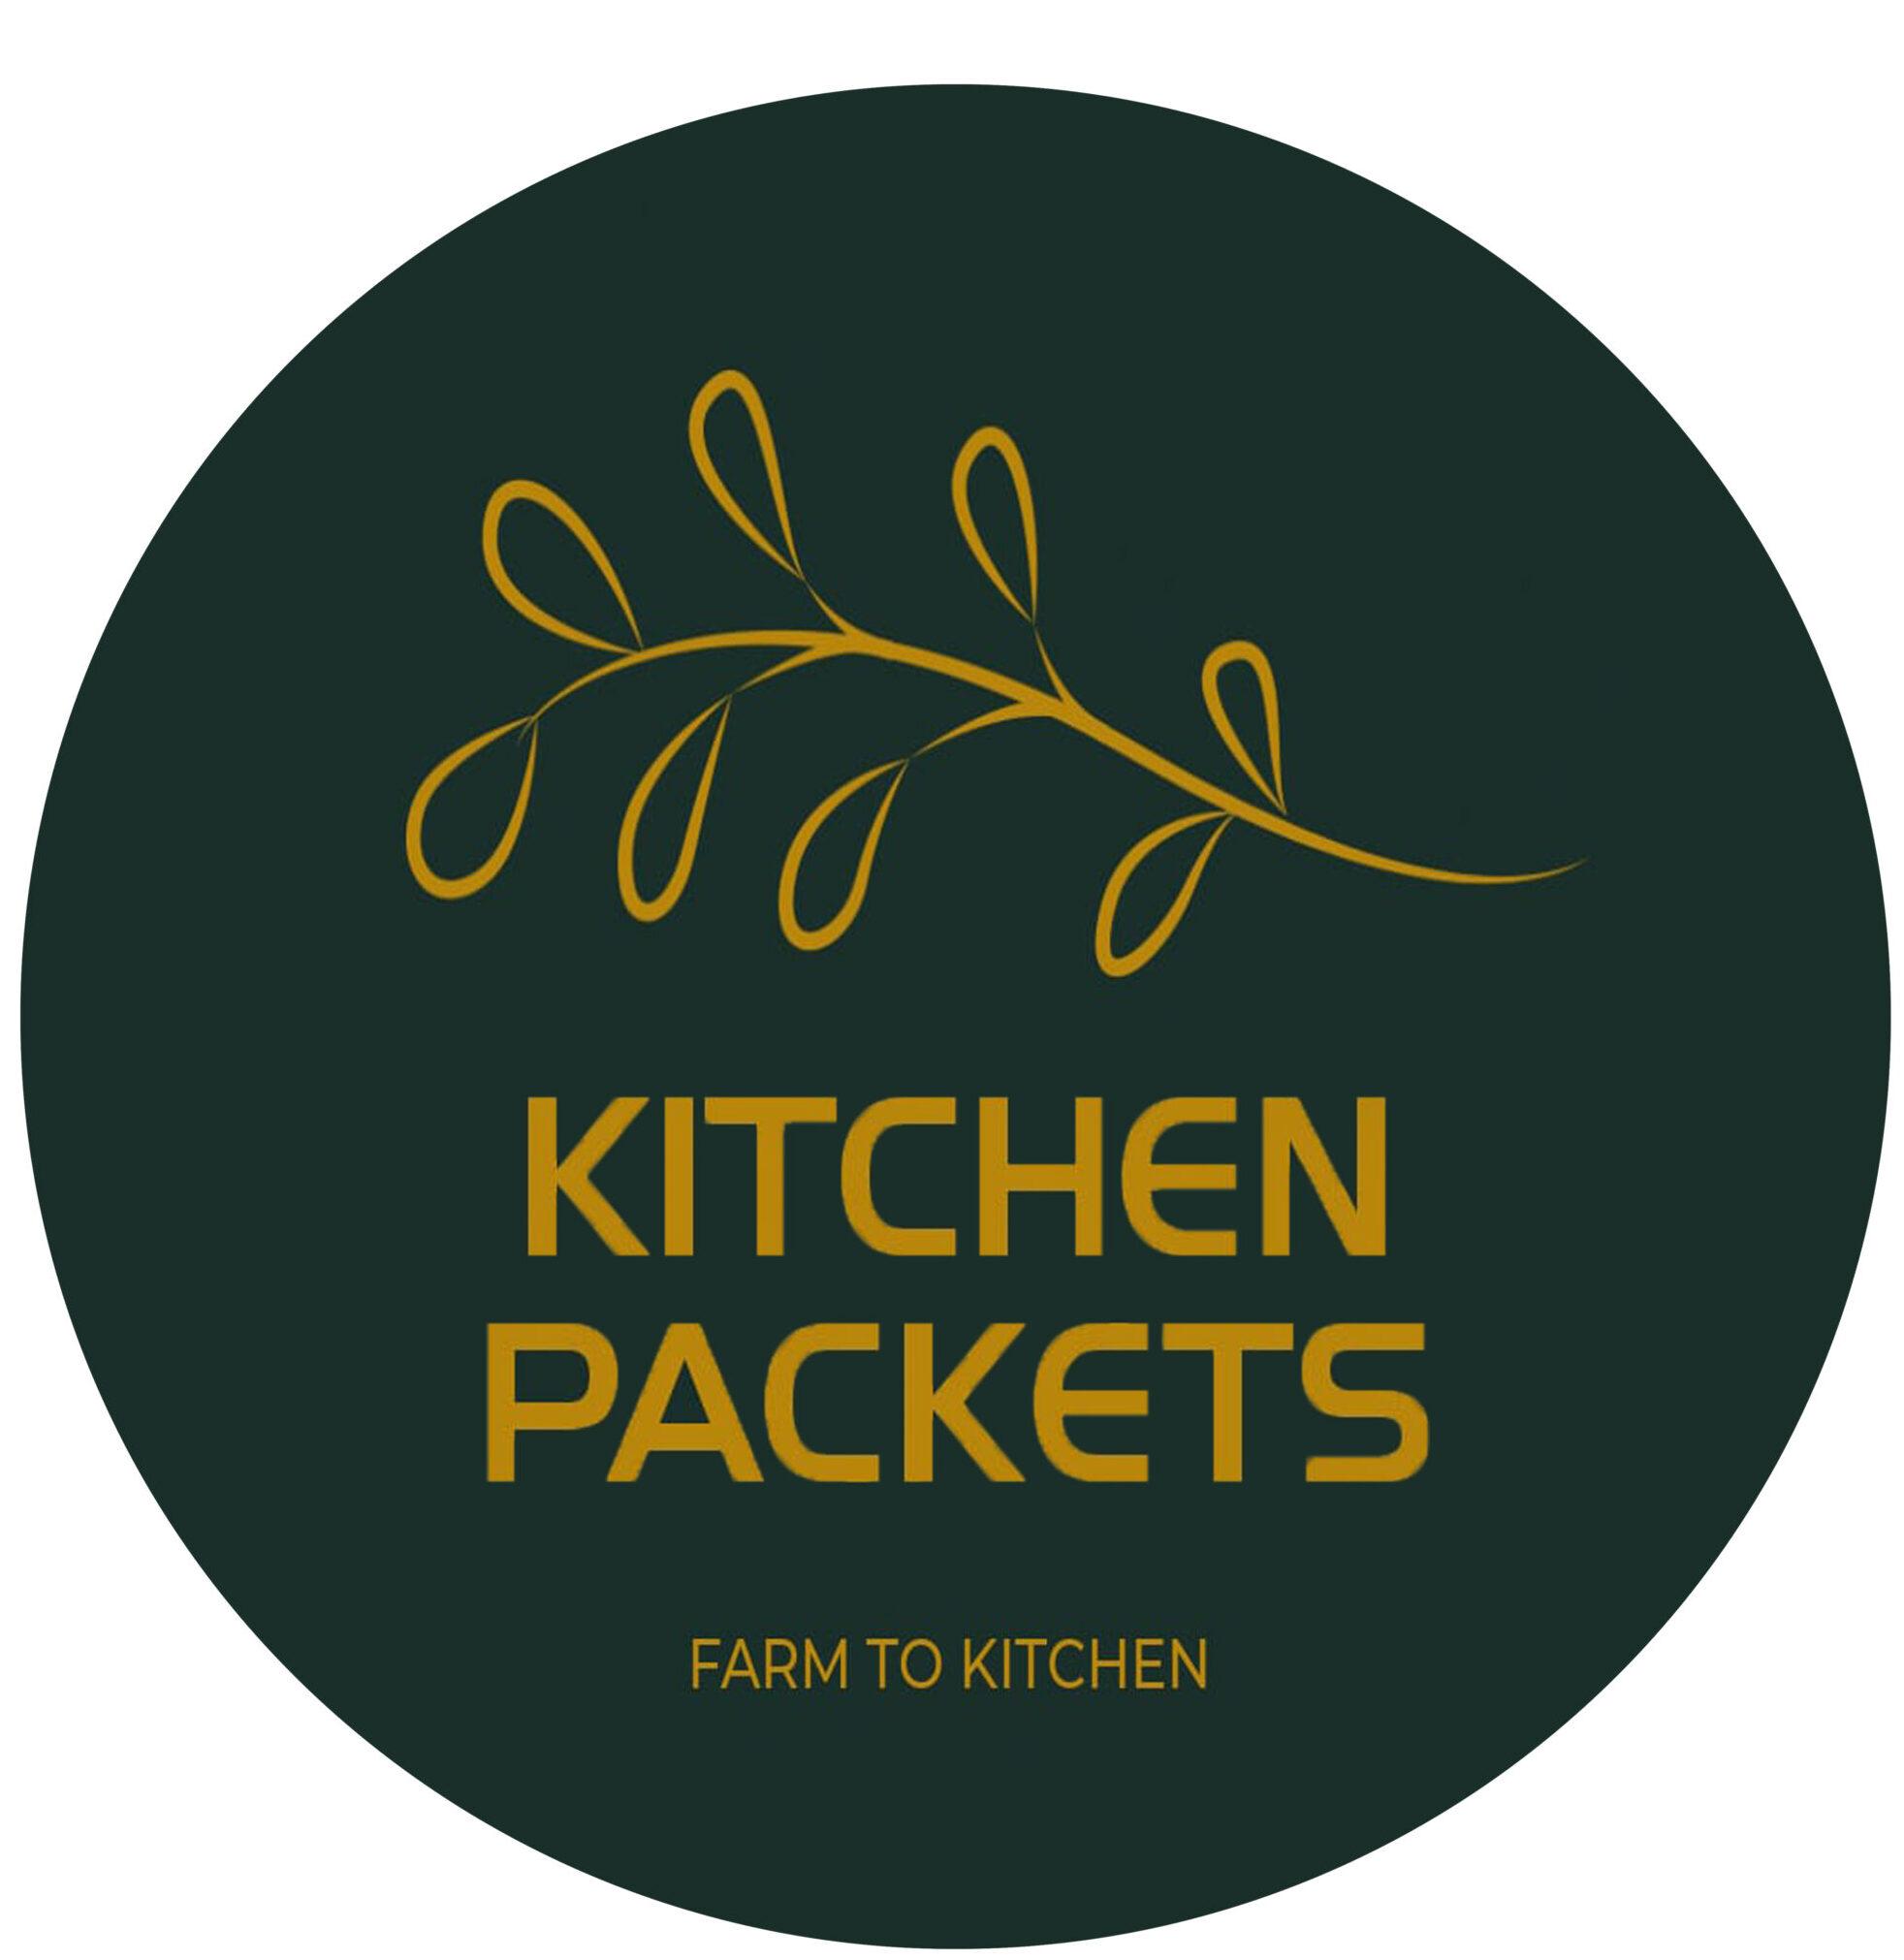 KitchenPackets